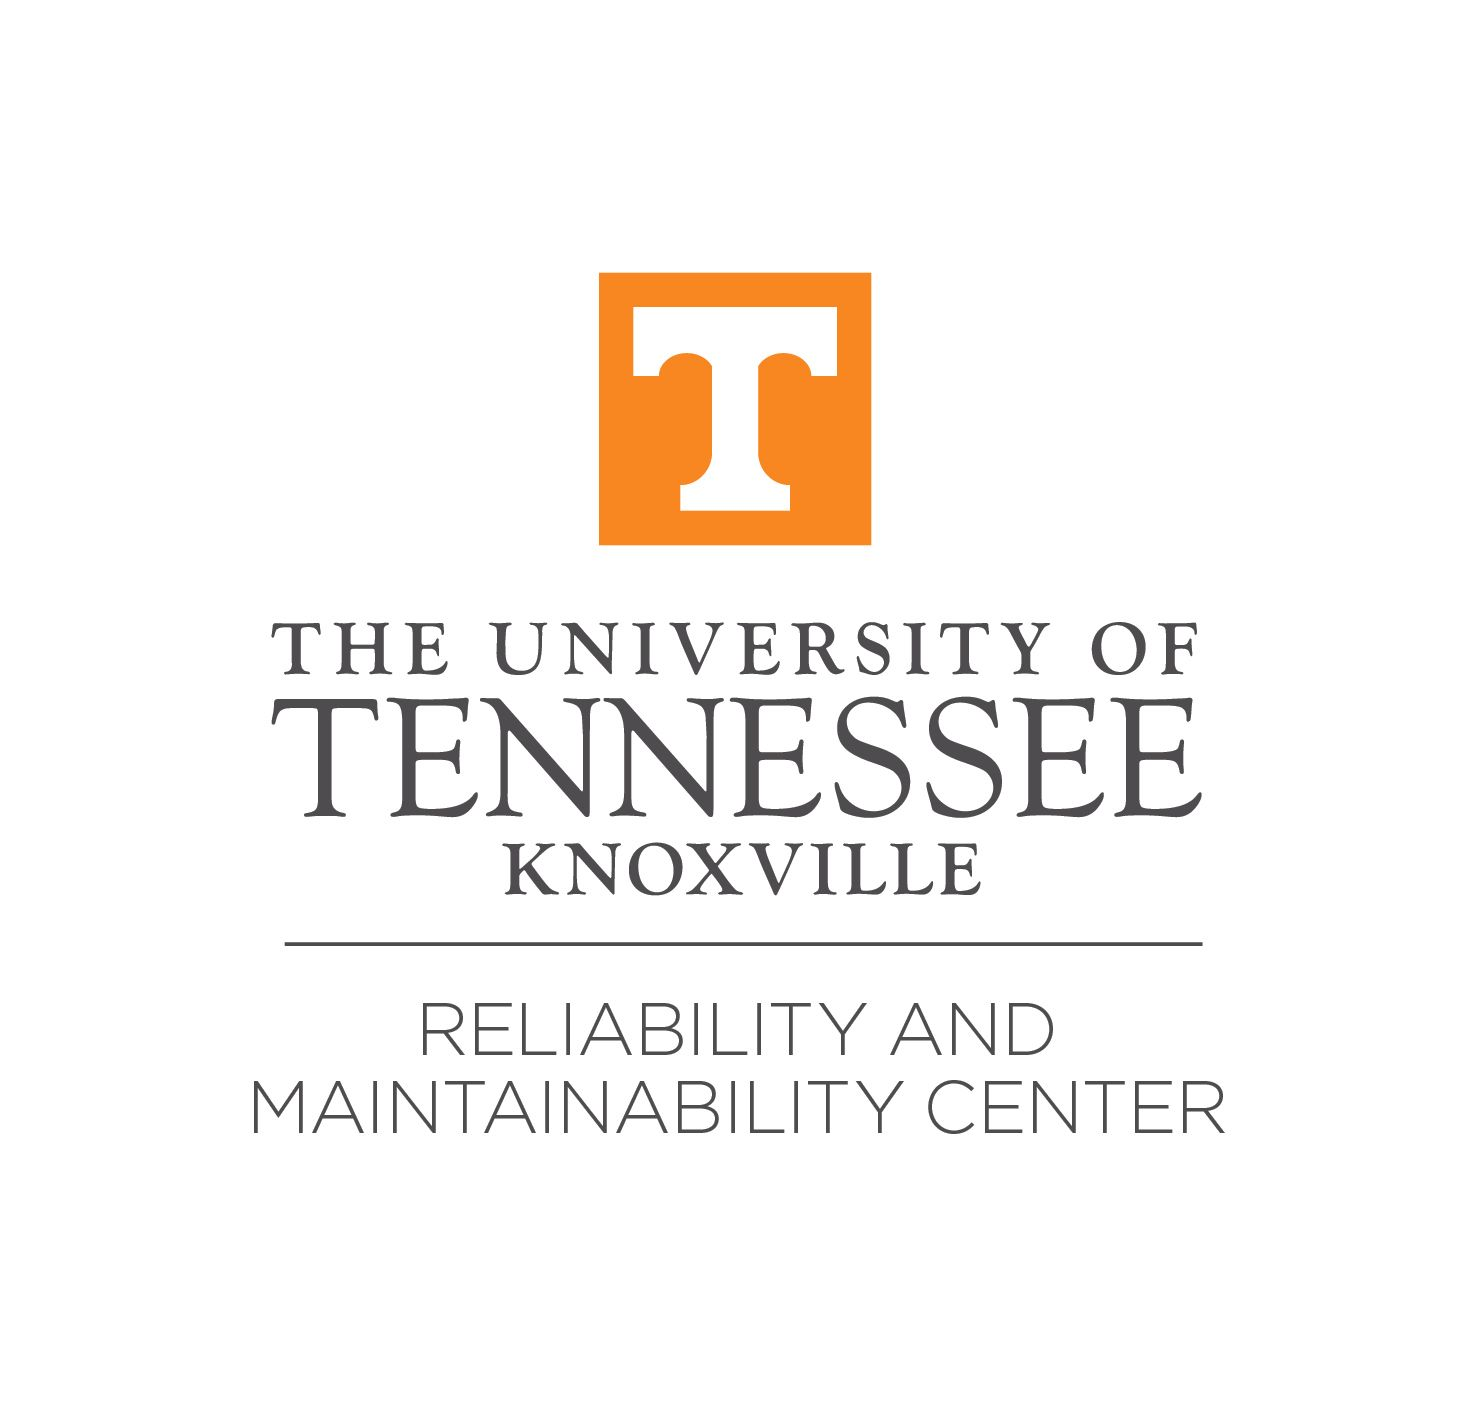 UT Reliability & Maintainability Center